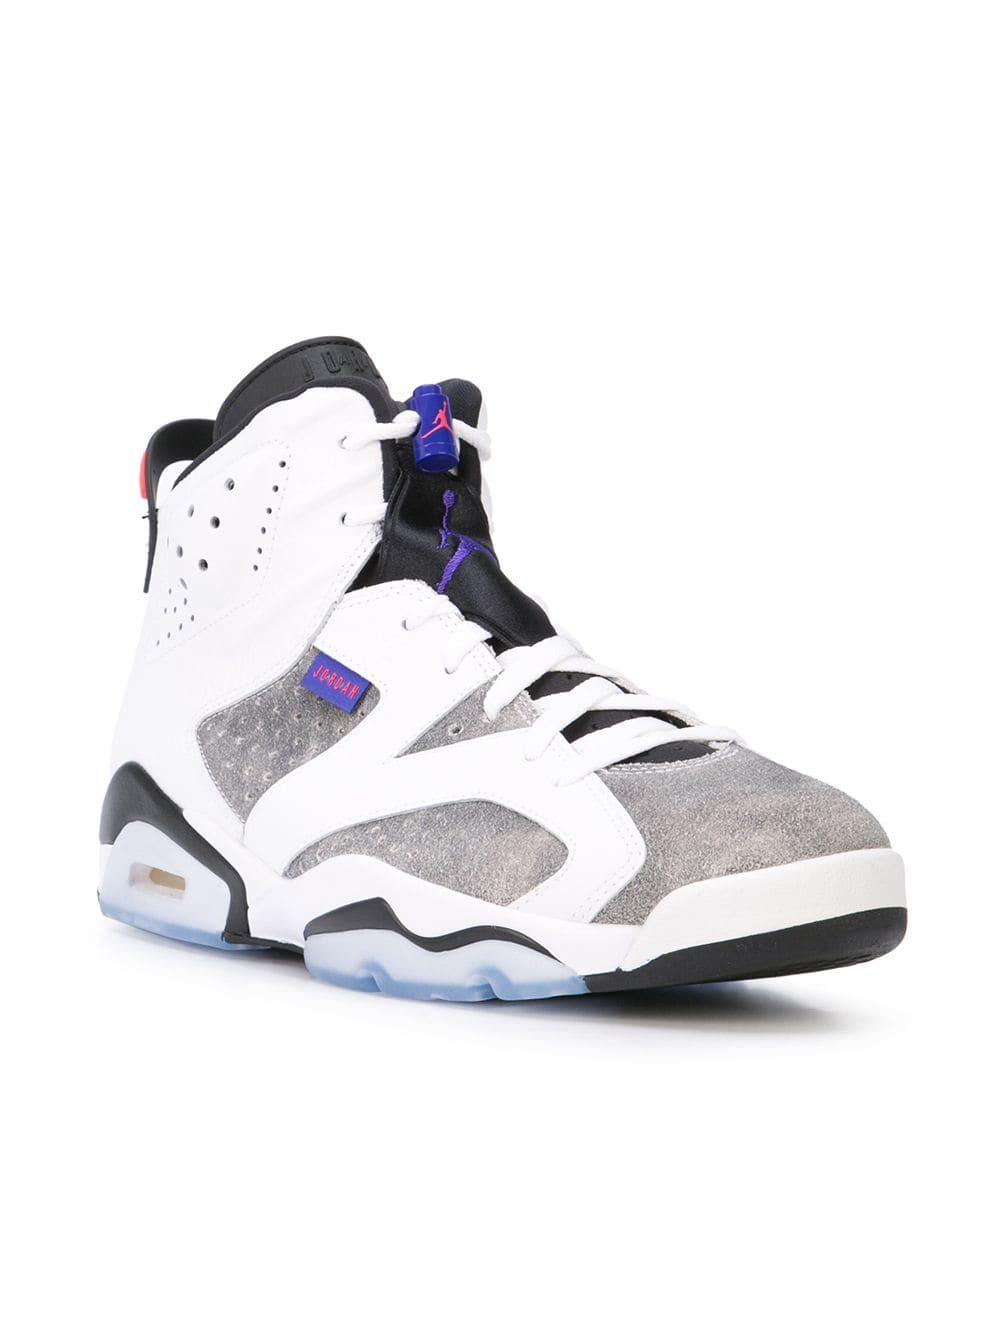 8e57f2c0634f Lyst - Nike Air Jordan 6 Retro Ltr Sneakers in White for Men - Save 23%